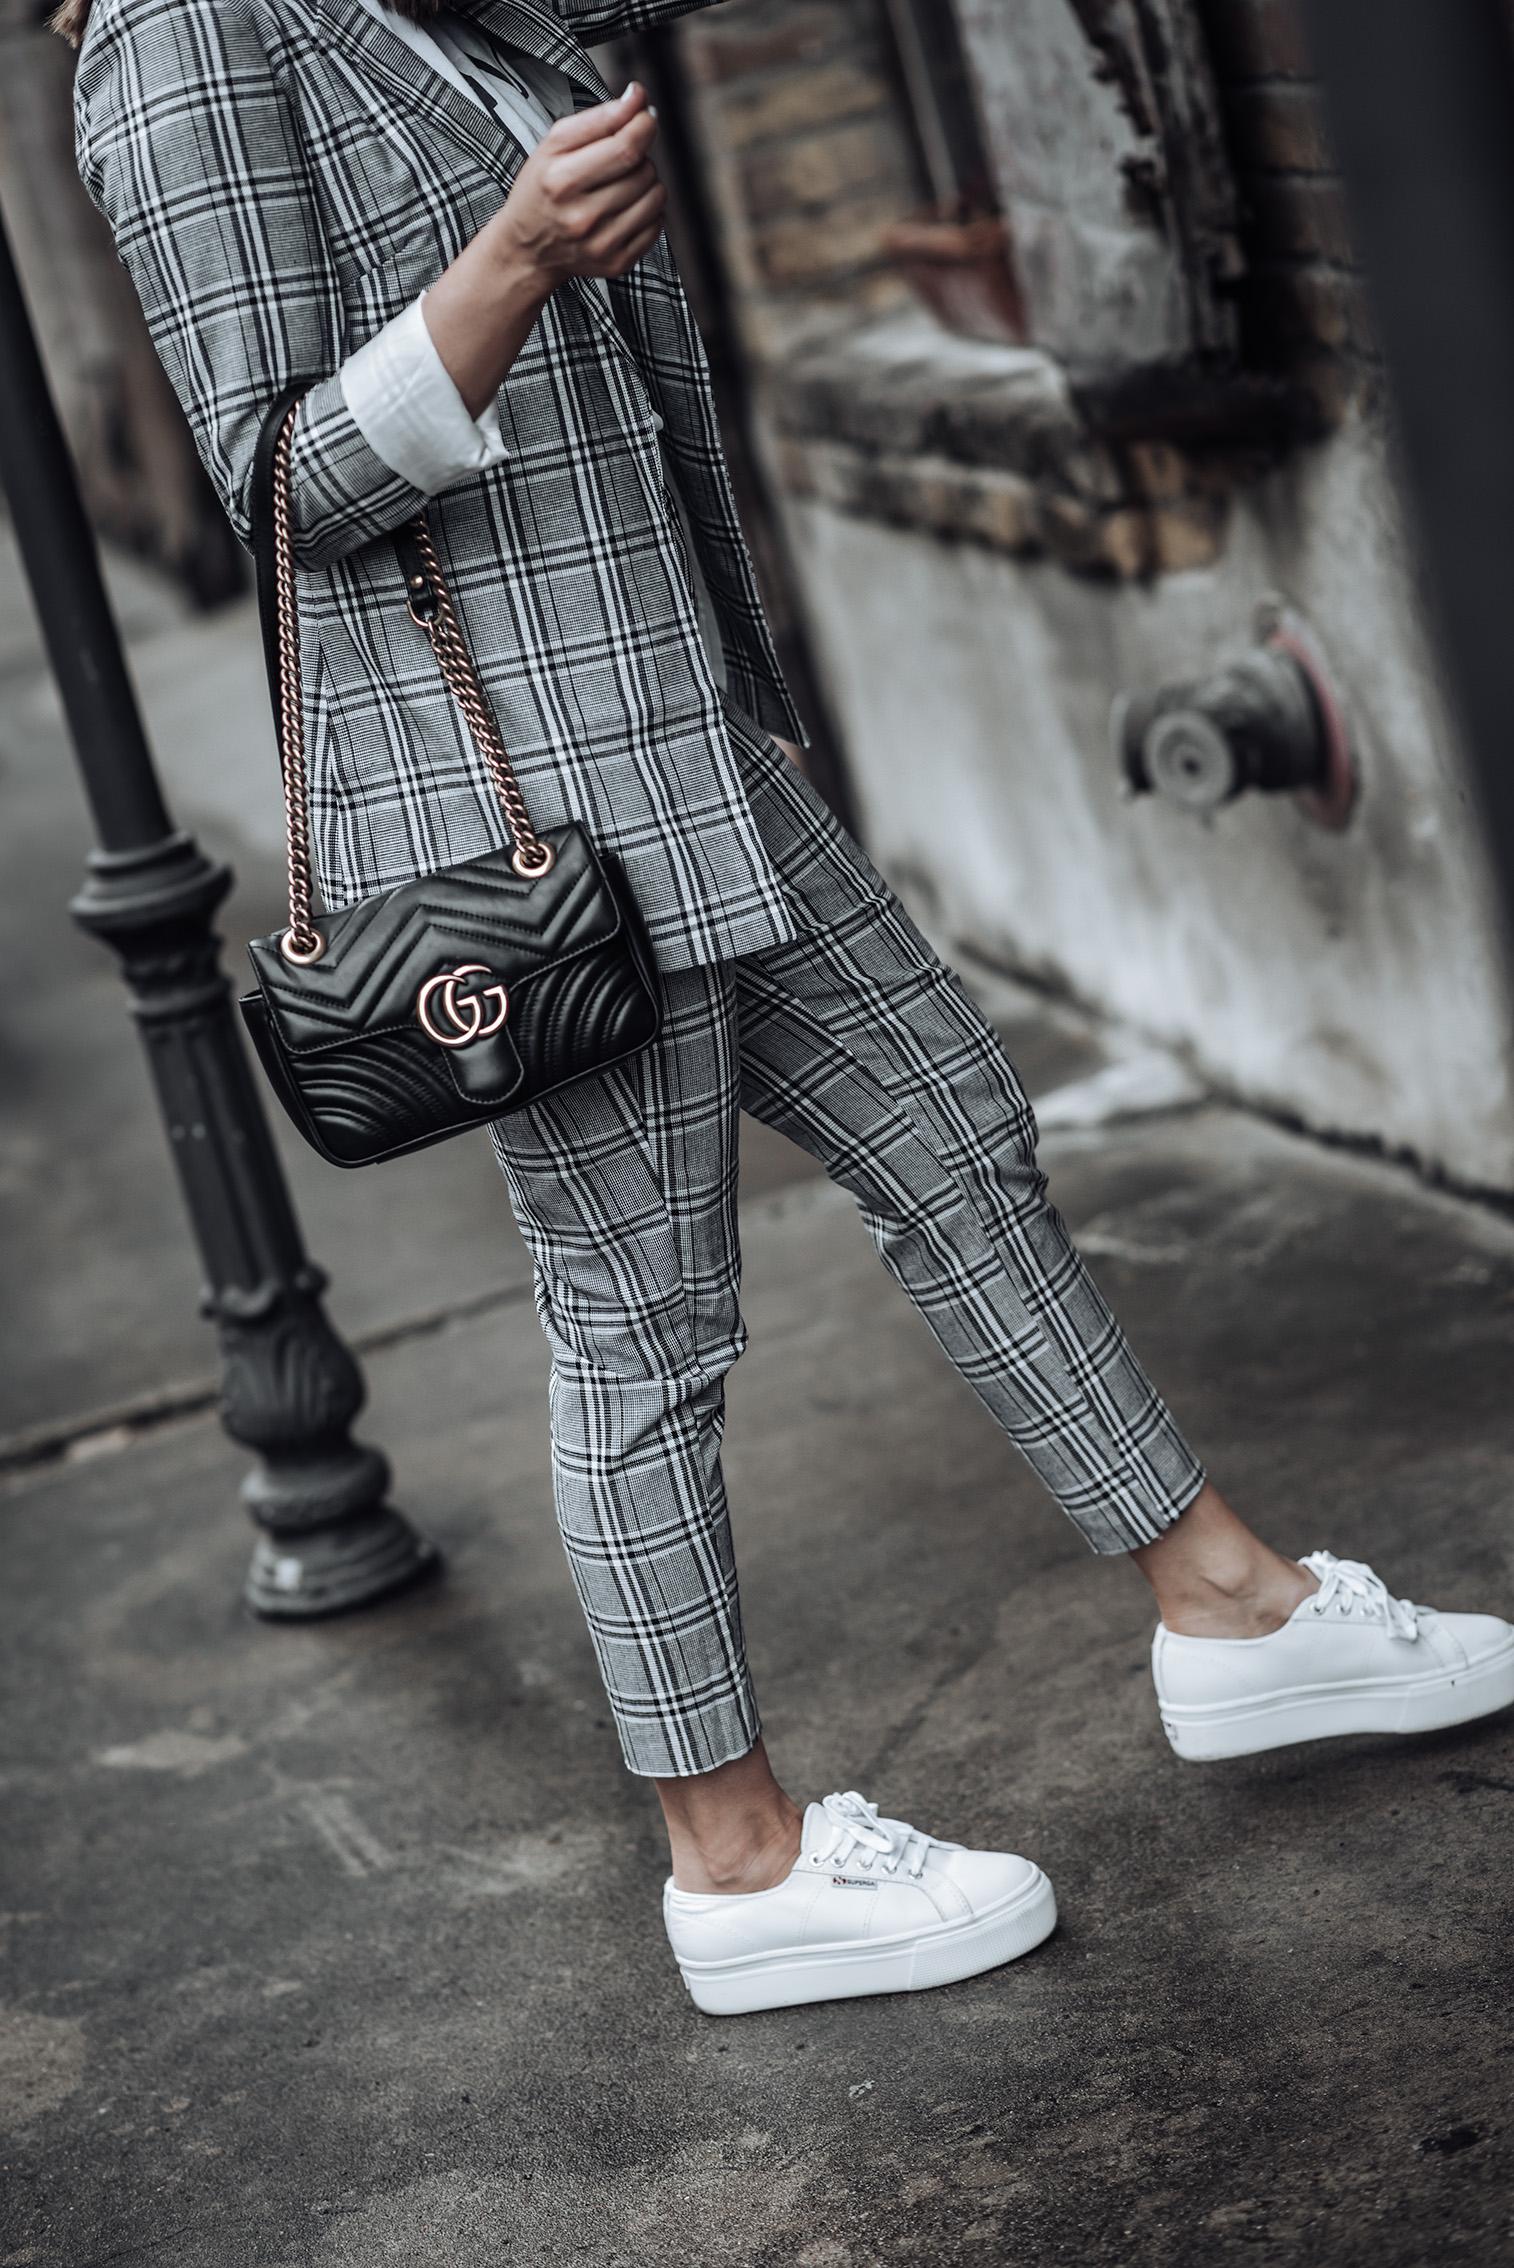 Checked Longline Blazer | Grey Check print | Checked Print Pants | Superga Platforms | Les Girls Tee | Mini GG Marmont #streetstyle2018 #womenssuit #graphictee #minimalistblogger #minimal